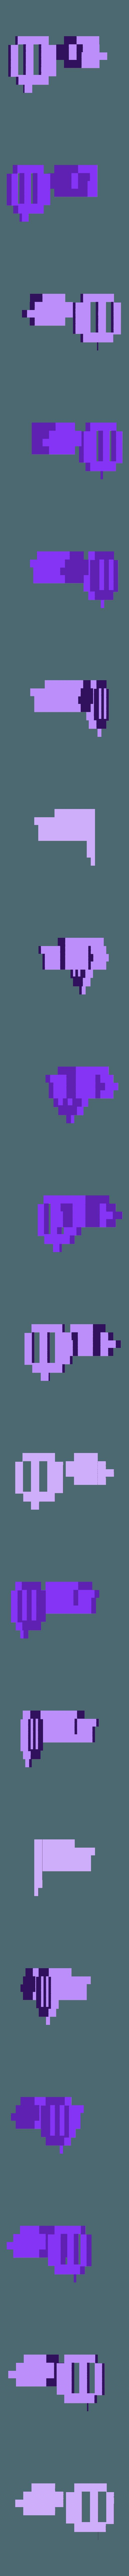 White_Parts_80.stl Download free STL file 8 bits style Bubble Bobble Dragon - Separate parts (no glue needed) • 3D print model, conceptify